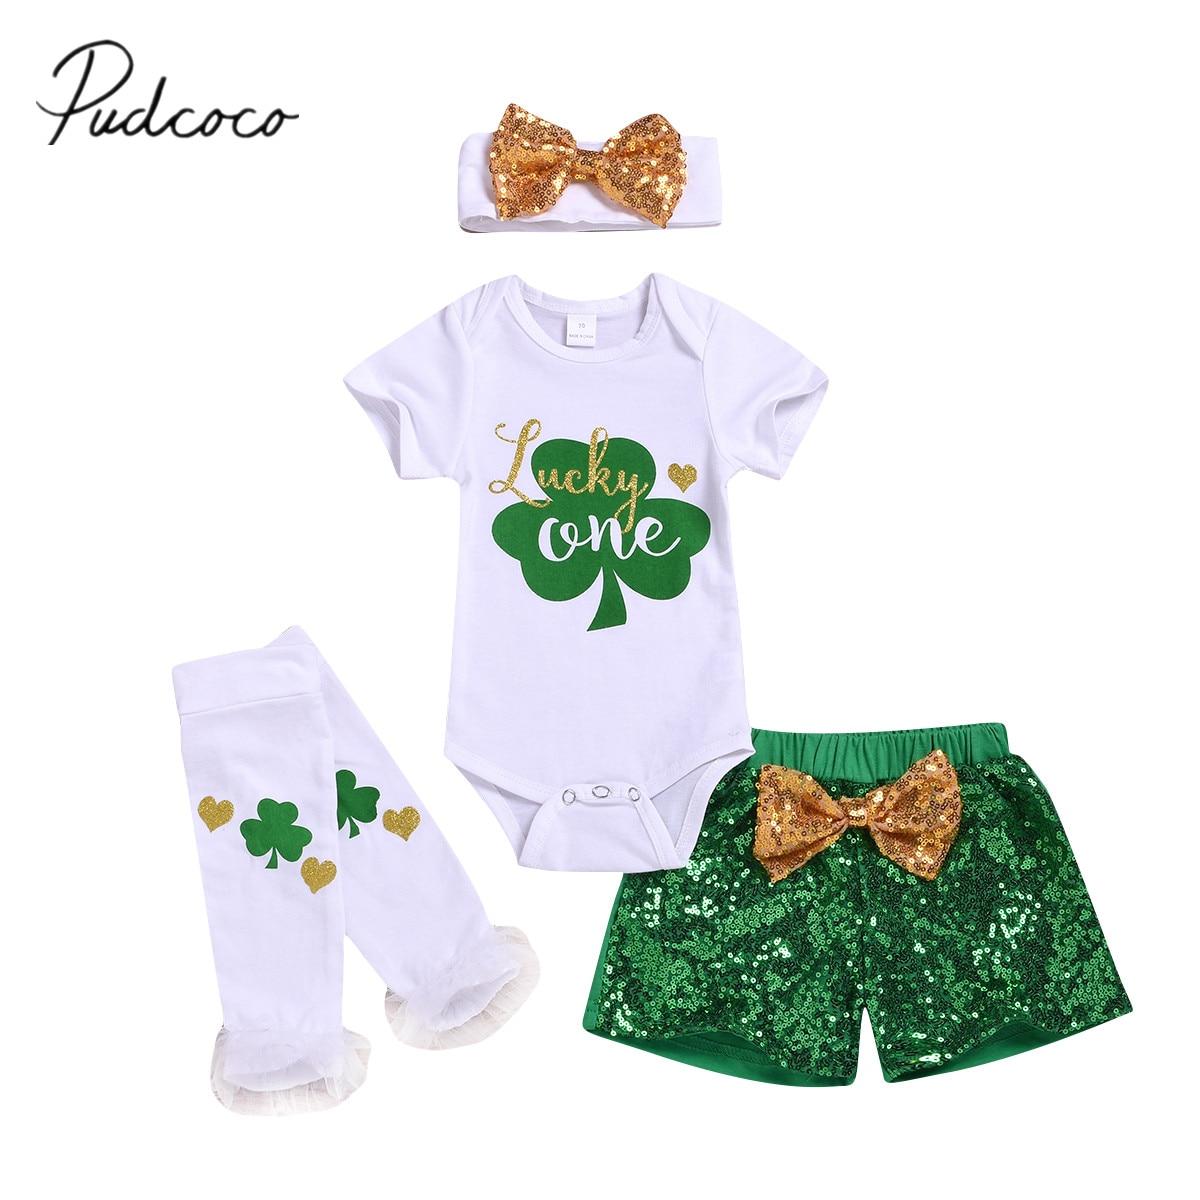 Patrick Day Bloomers Pants Outfits Set Newborn Kids Jumpsuit 2PCS Baby Girls St